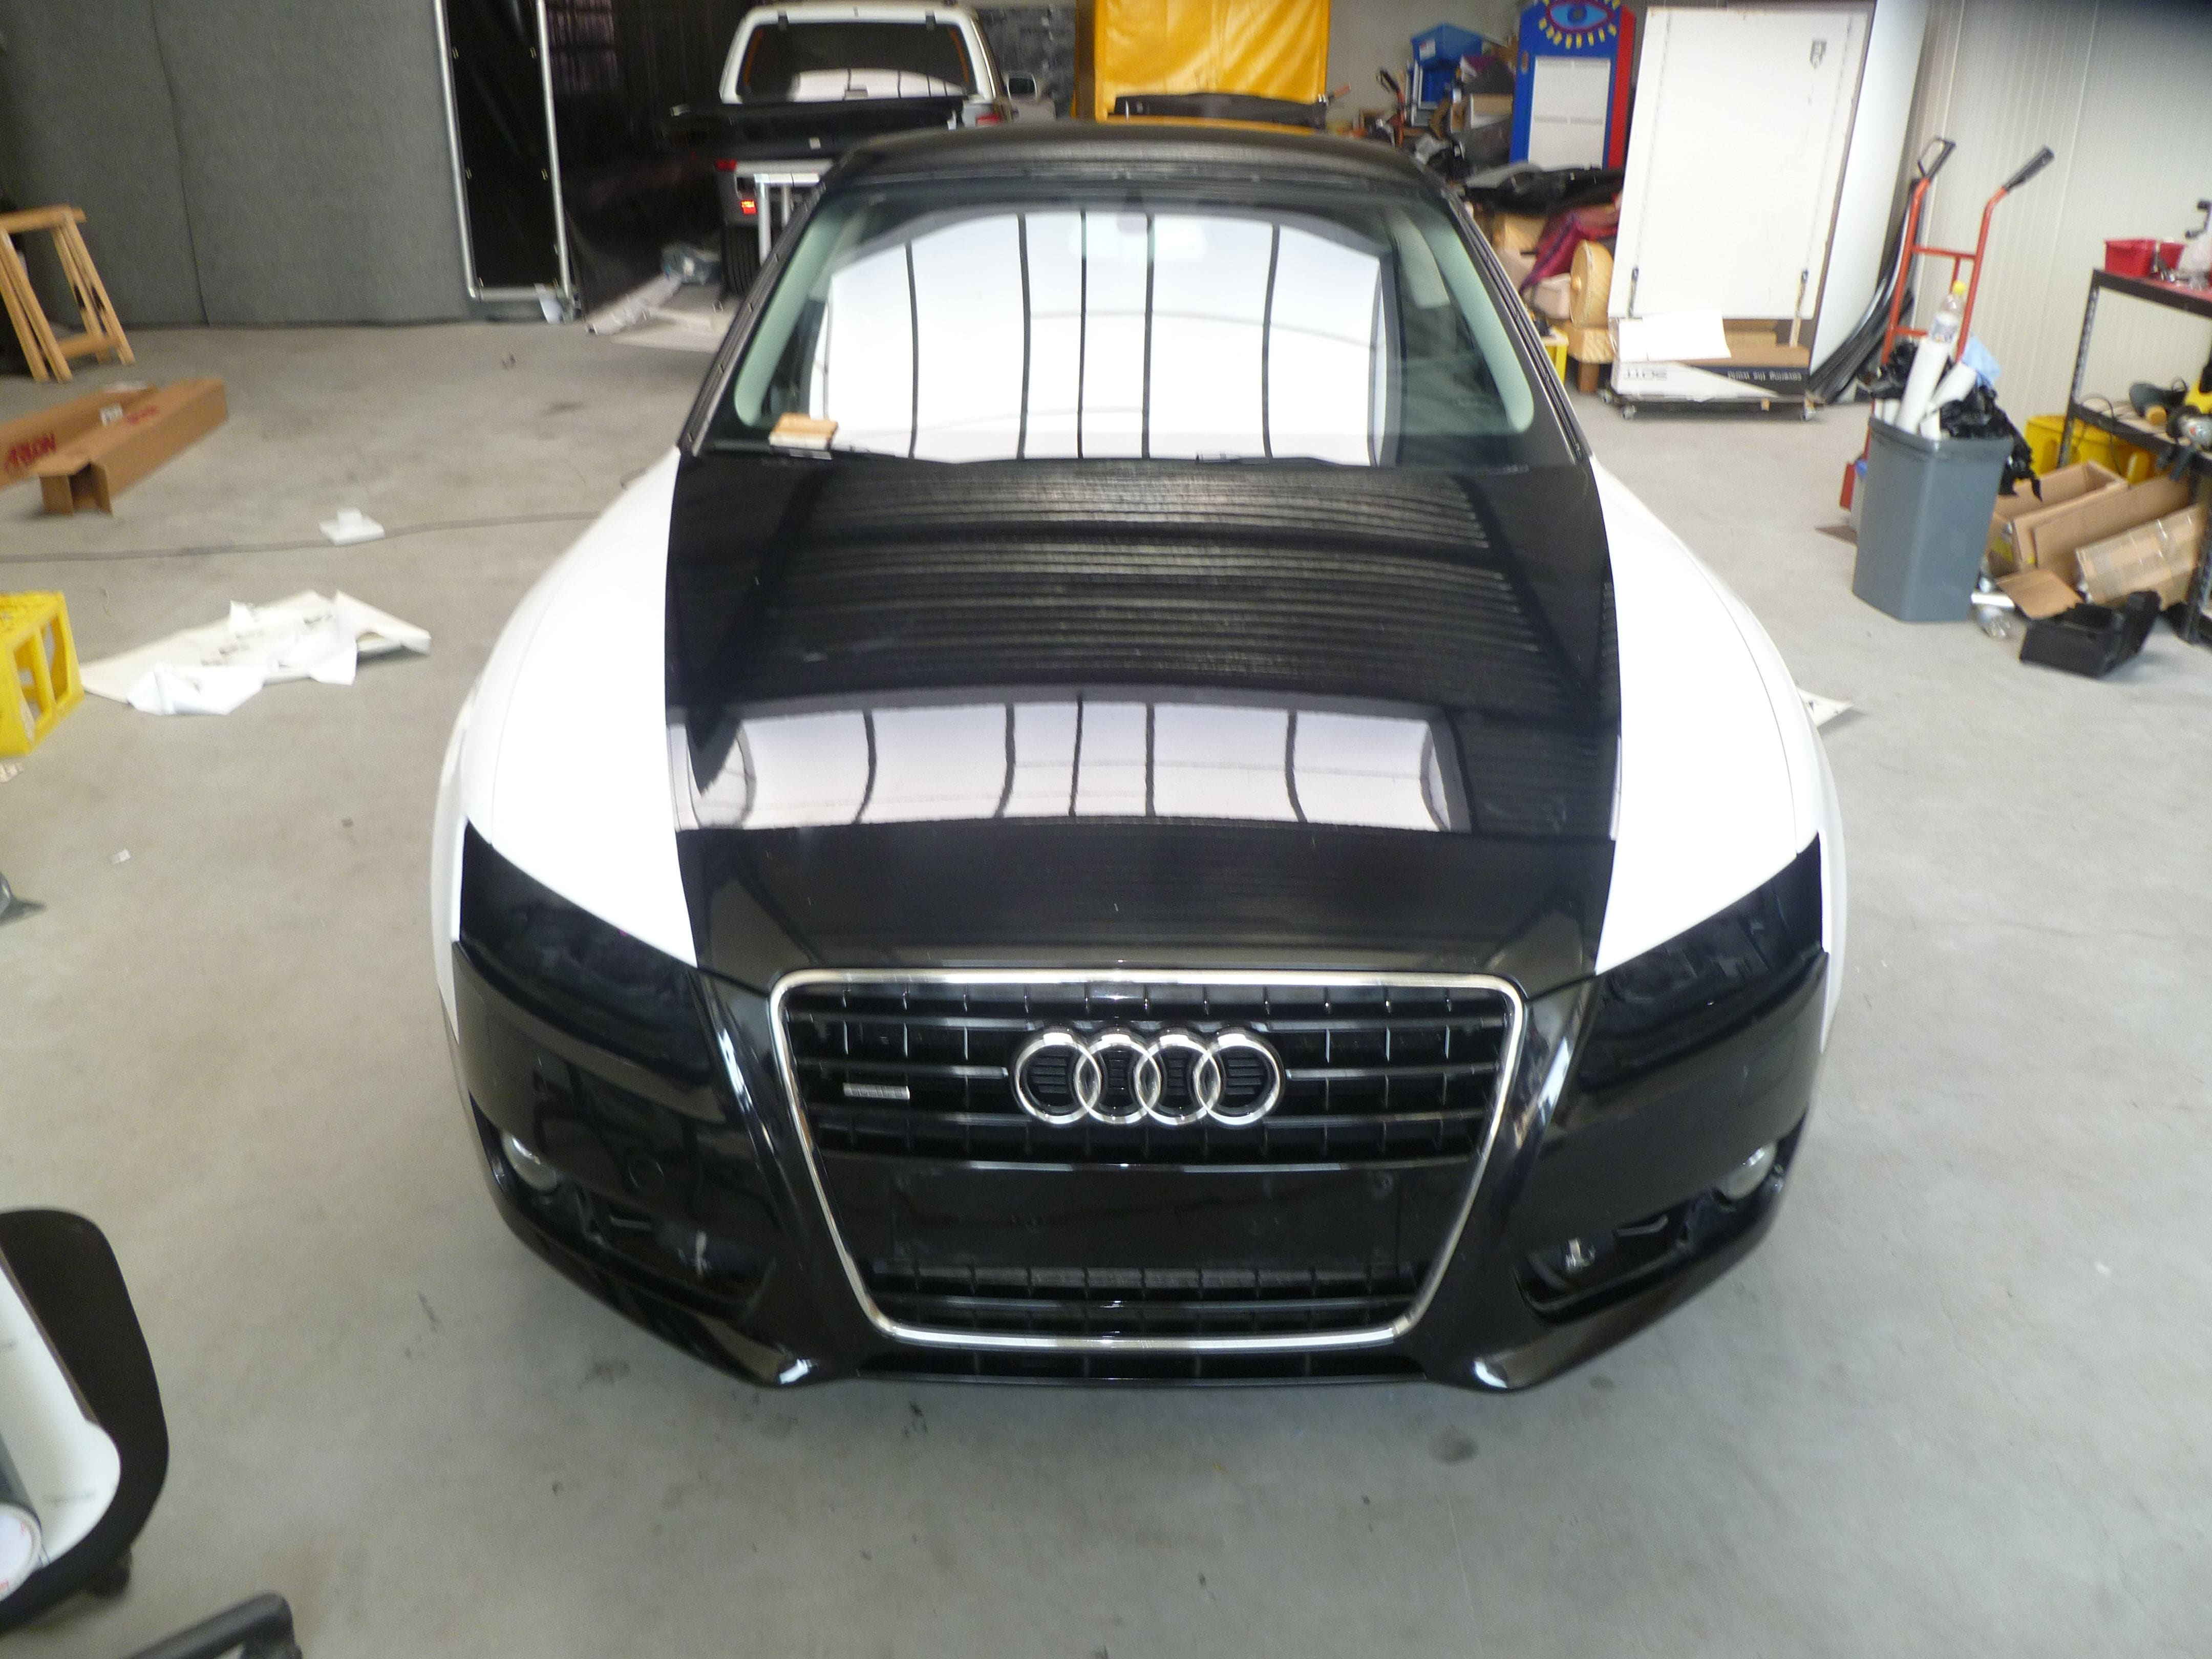 Audi A5 coupe met Metallic Witte Wrap, Carwrapping door Wrapmyride.nu Foto-nr:4697, ©2021